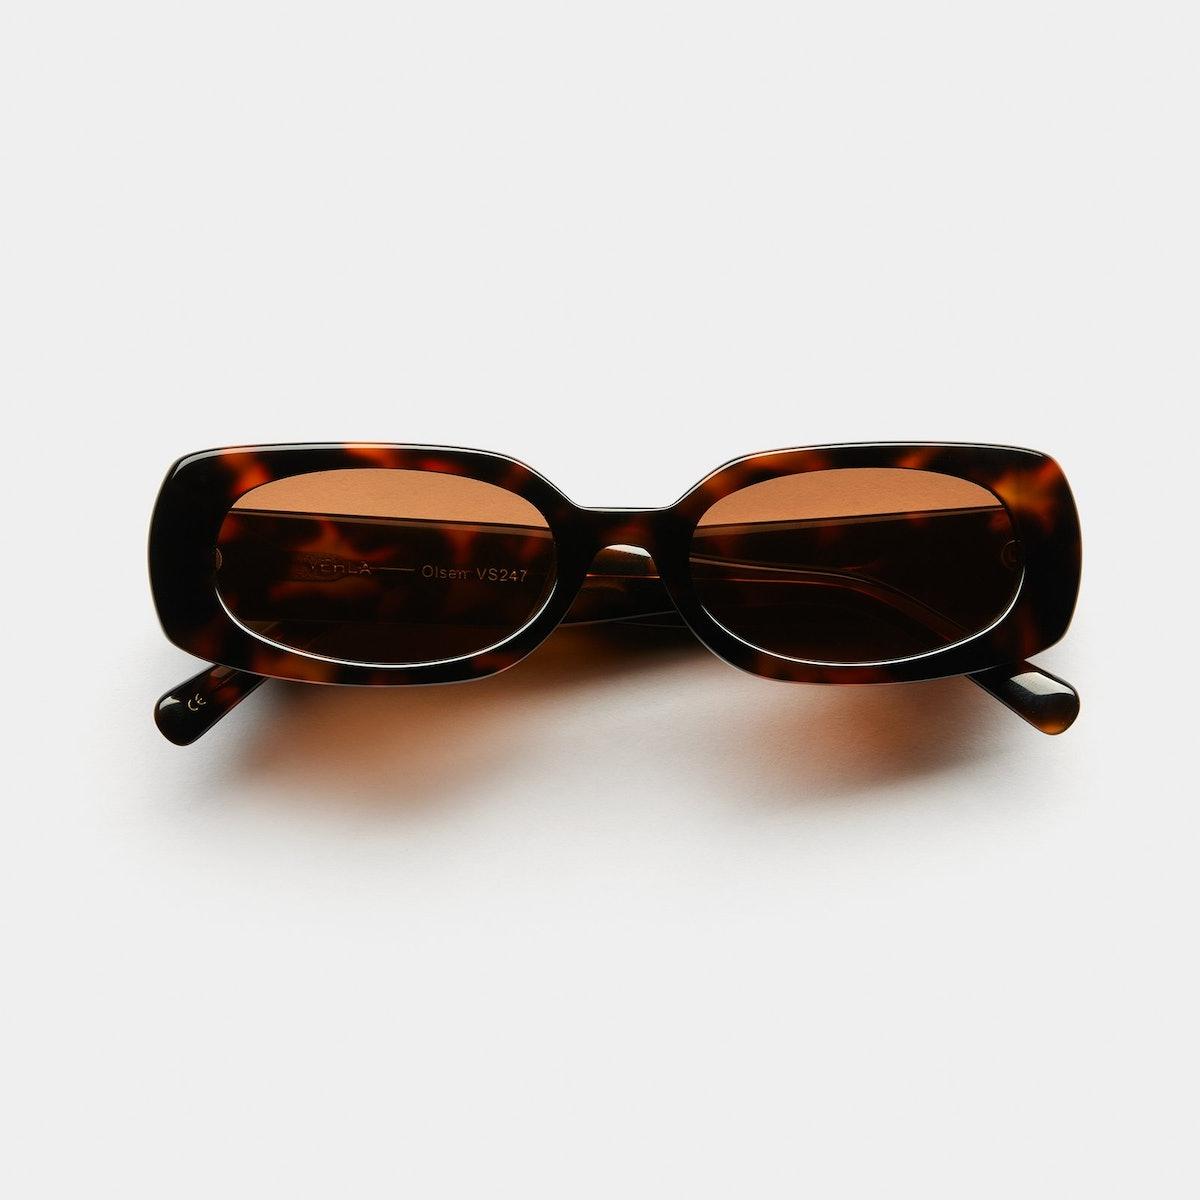 Olsen Sunglasses in Chocolate Tortoise from VEHLA eyewear.